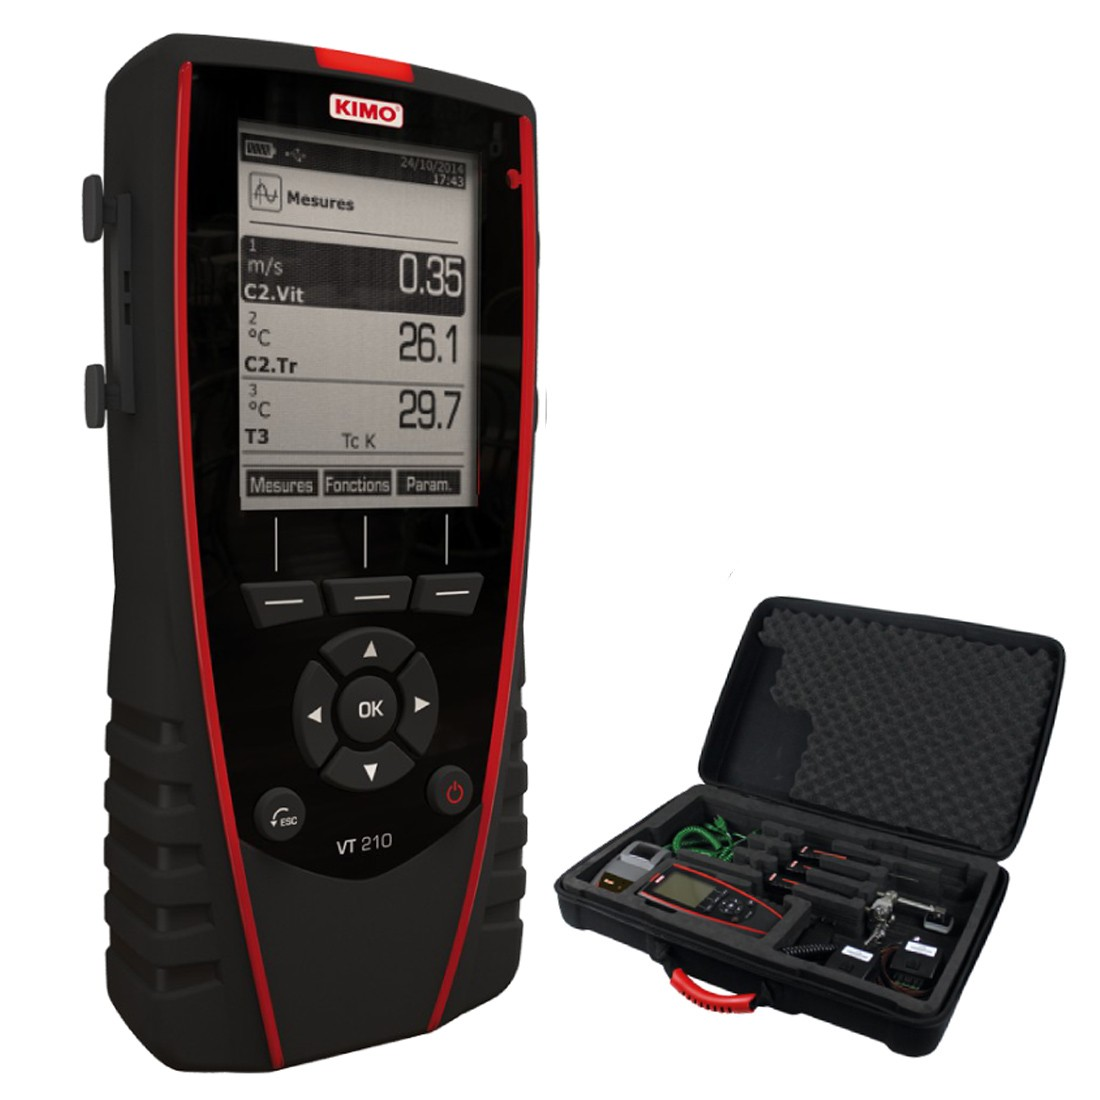 KIMO VT 210 Multifunktionsthermoanemometer, Hygrometer